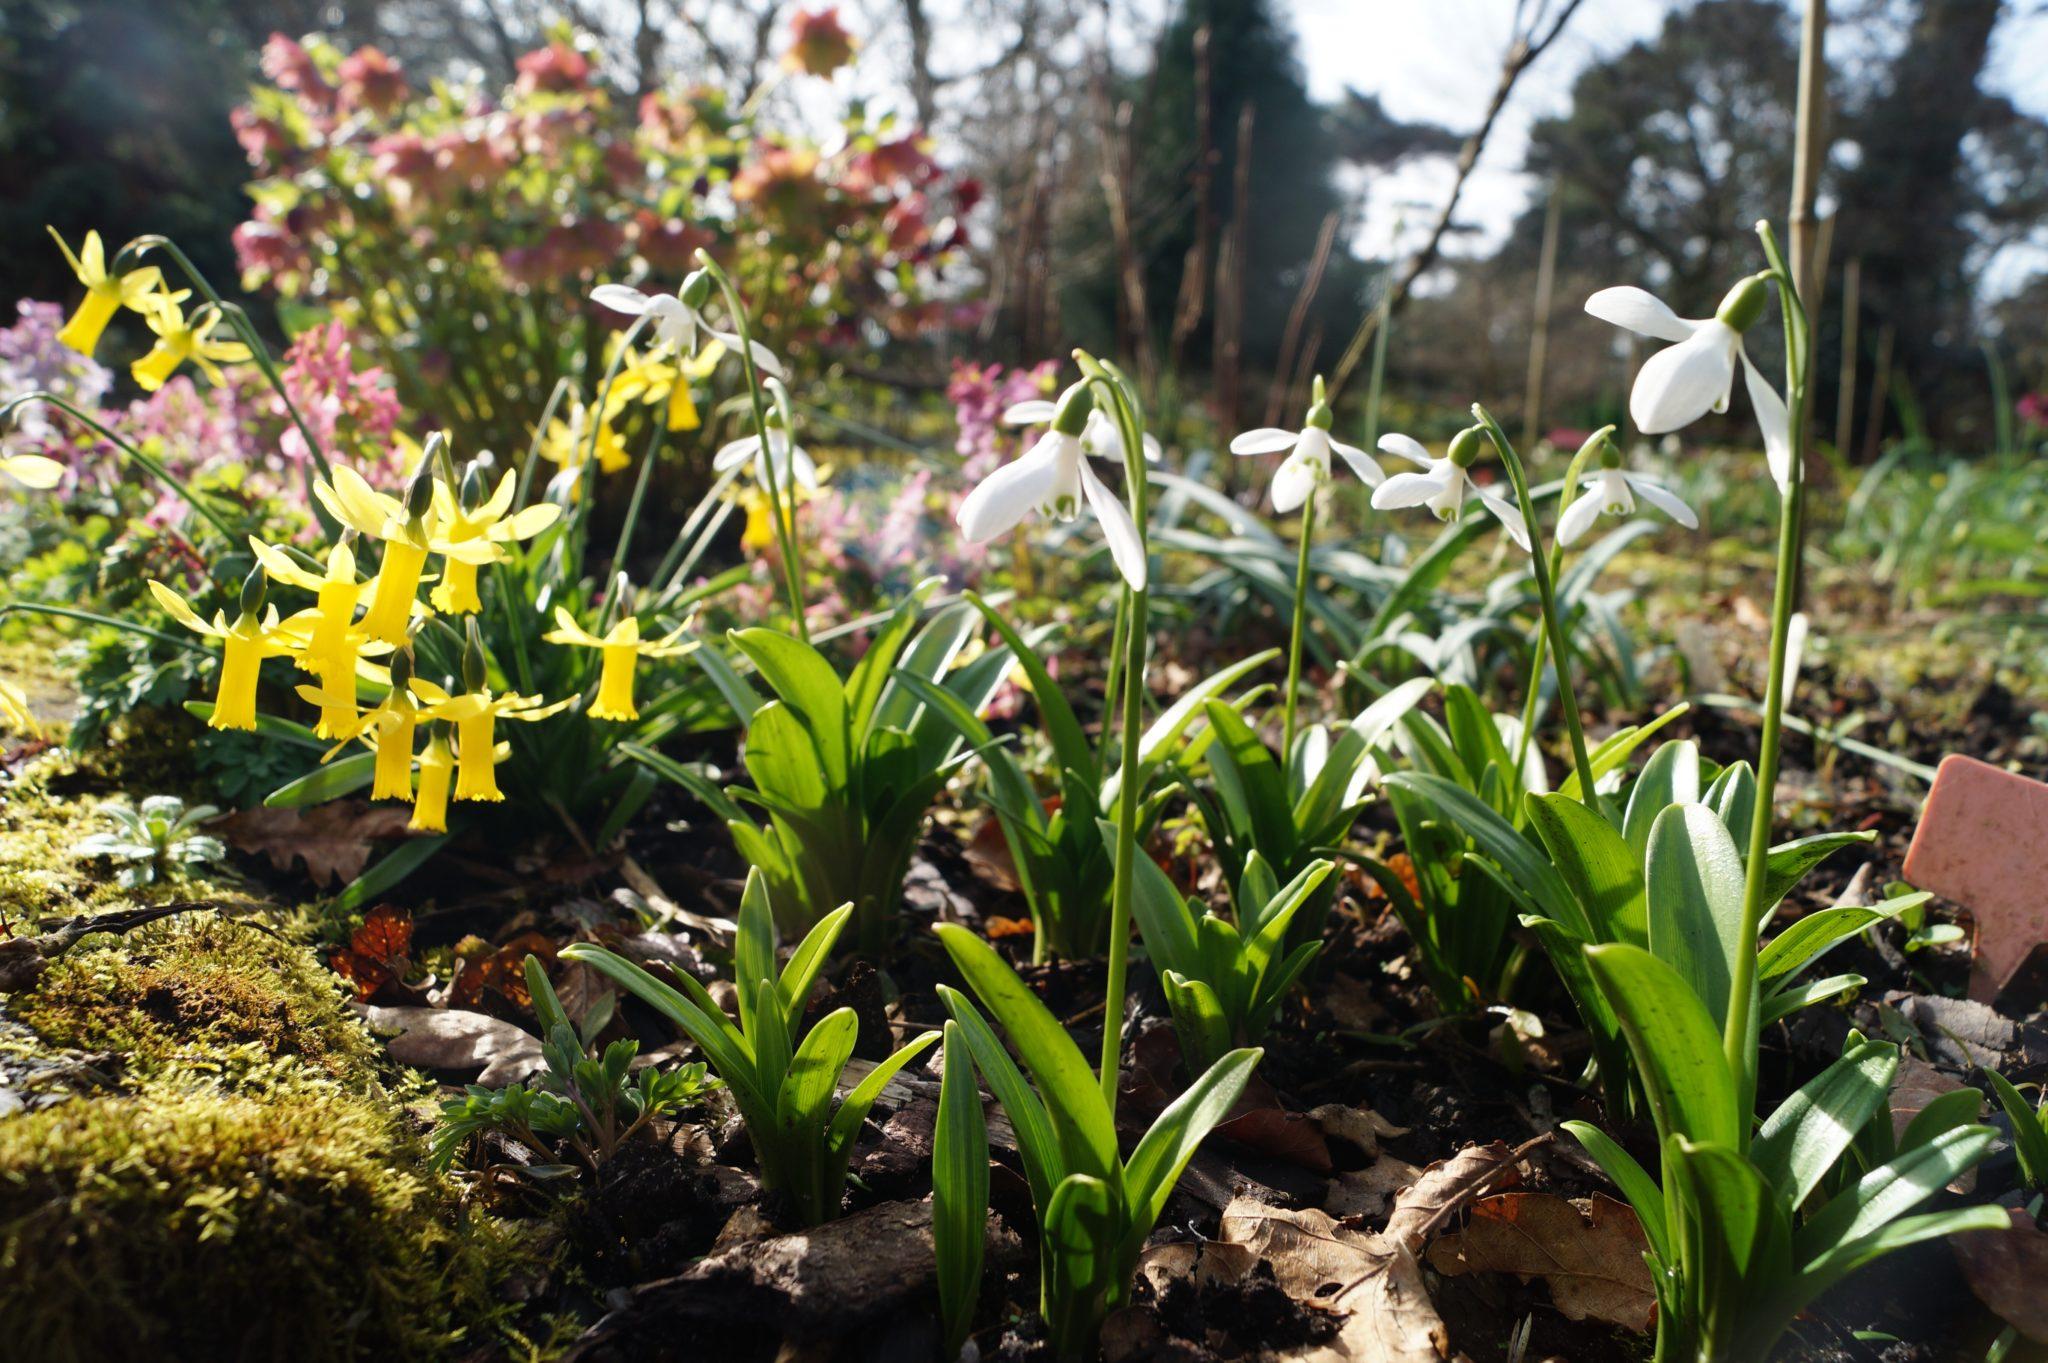 galanthus_woronowii_rodmarton_capella_morlas_plants